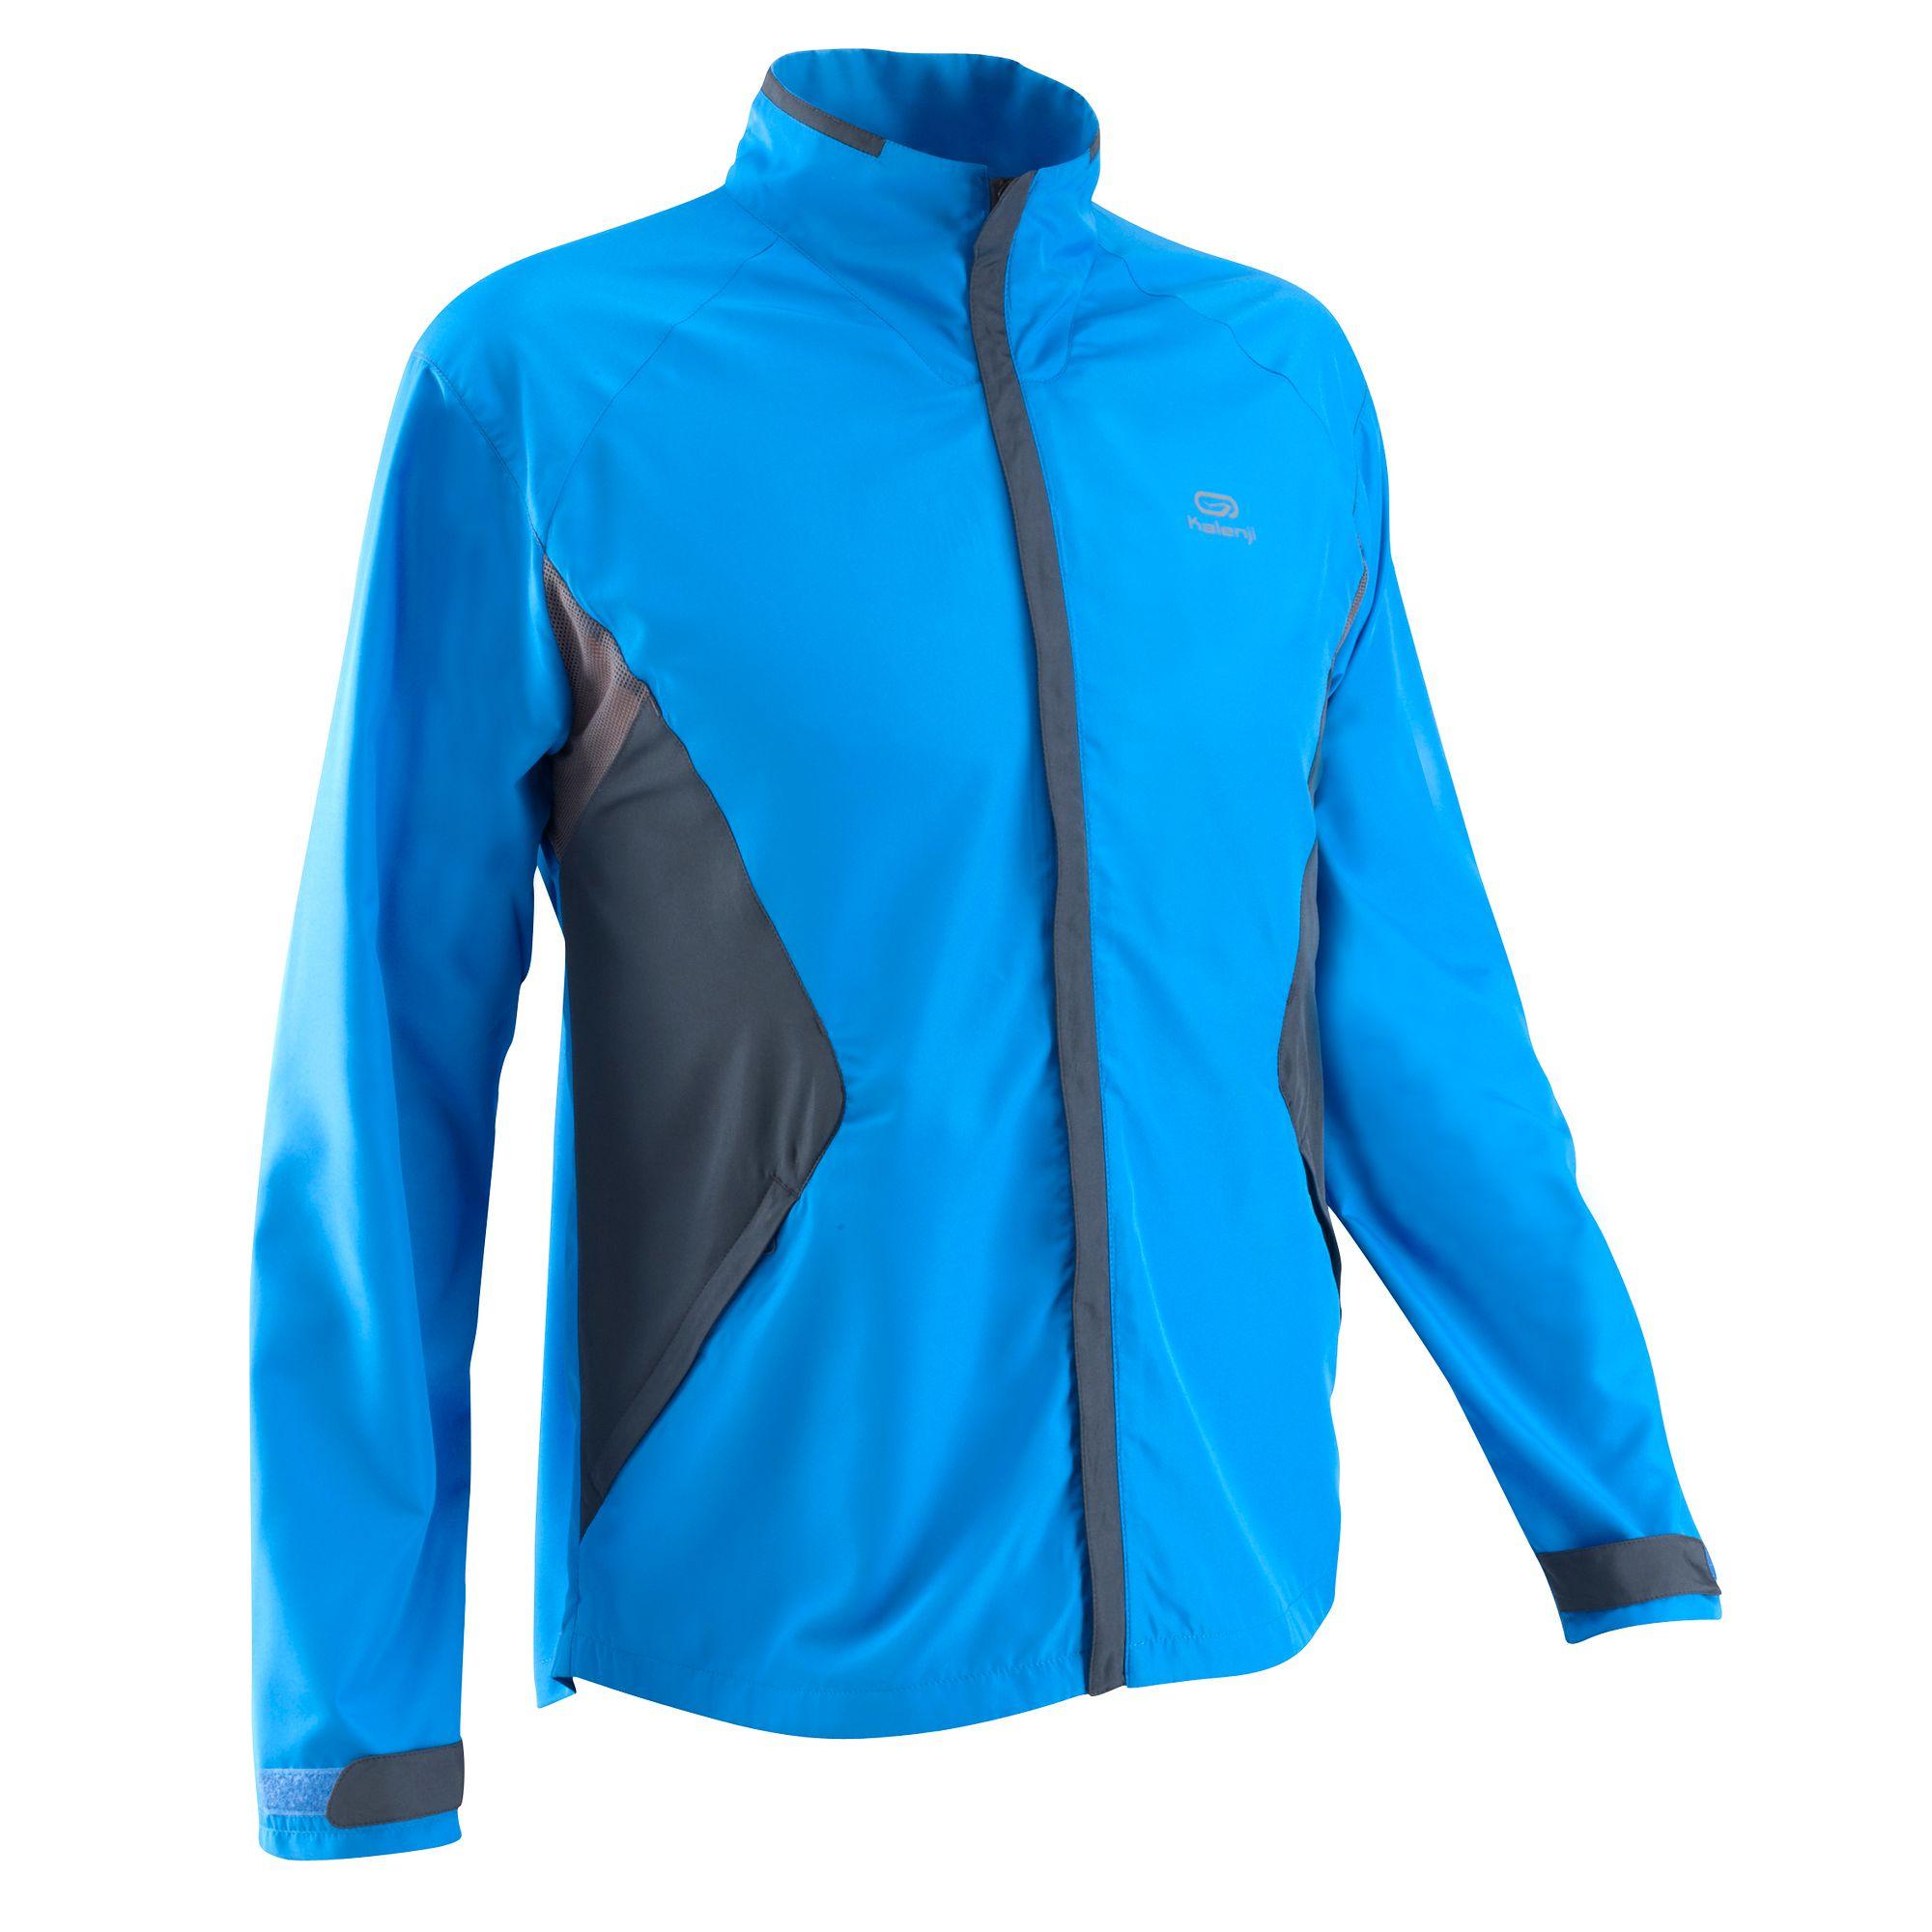 Veste Running homme Ekiden Wind bleu gris